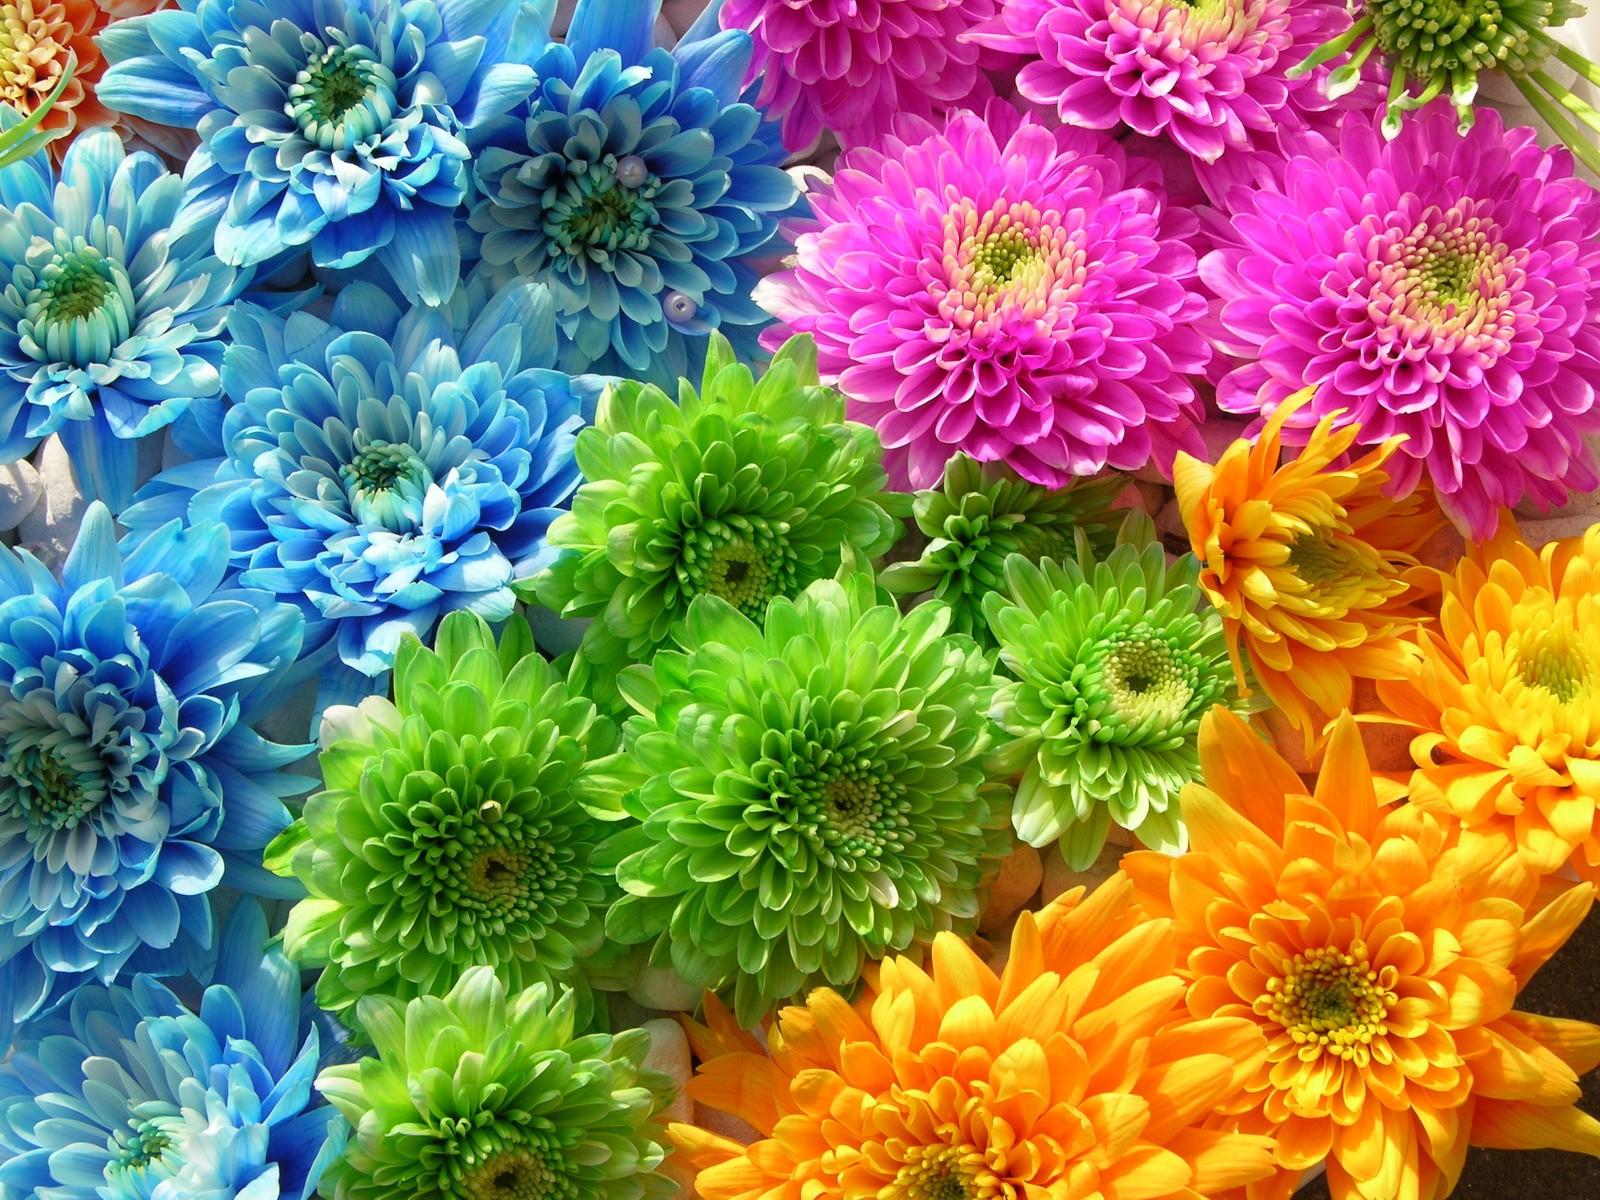 Download Multicolor Flowers Wallpaper 1600x1200 | Wallpoper #401900